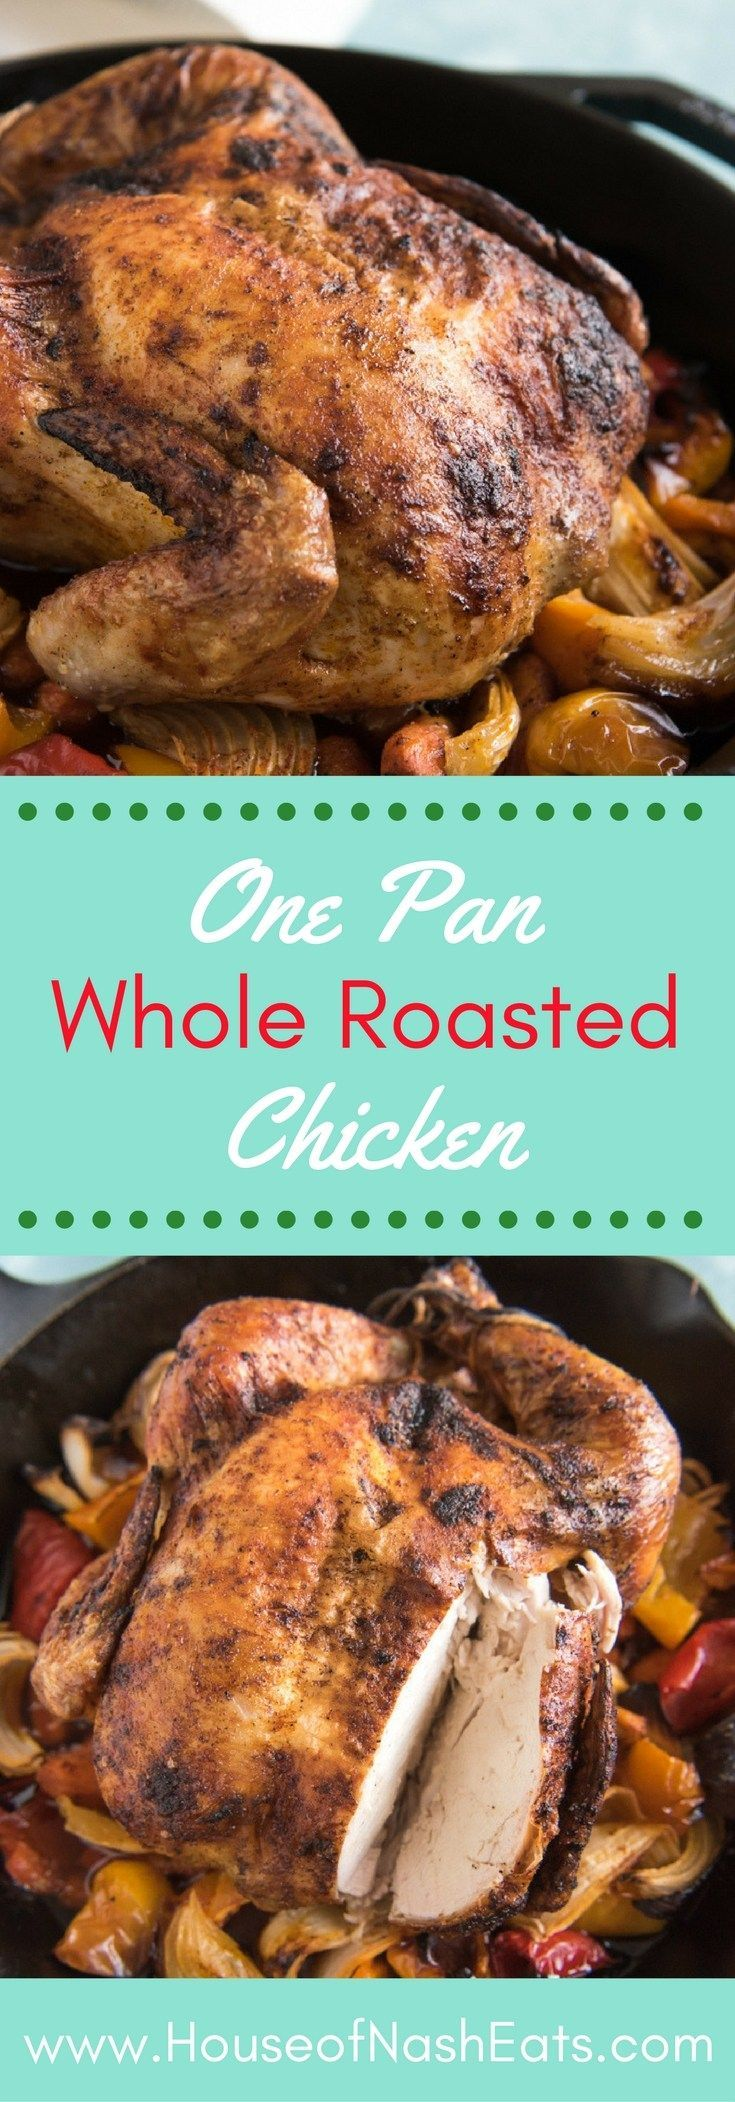 1053 best Chicken & Turkey images on Pinterest | Asia, Asian food ...